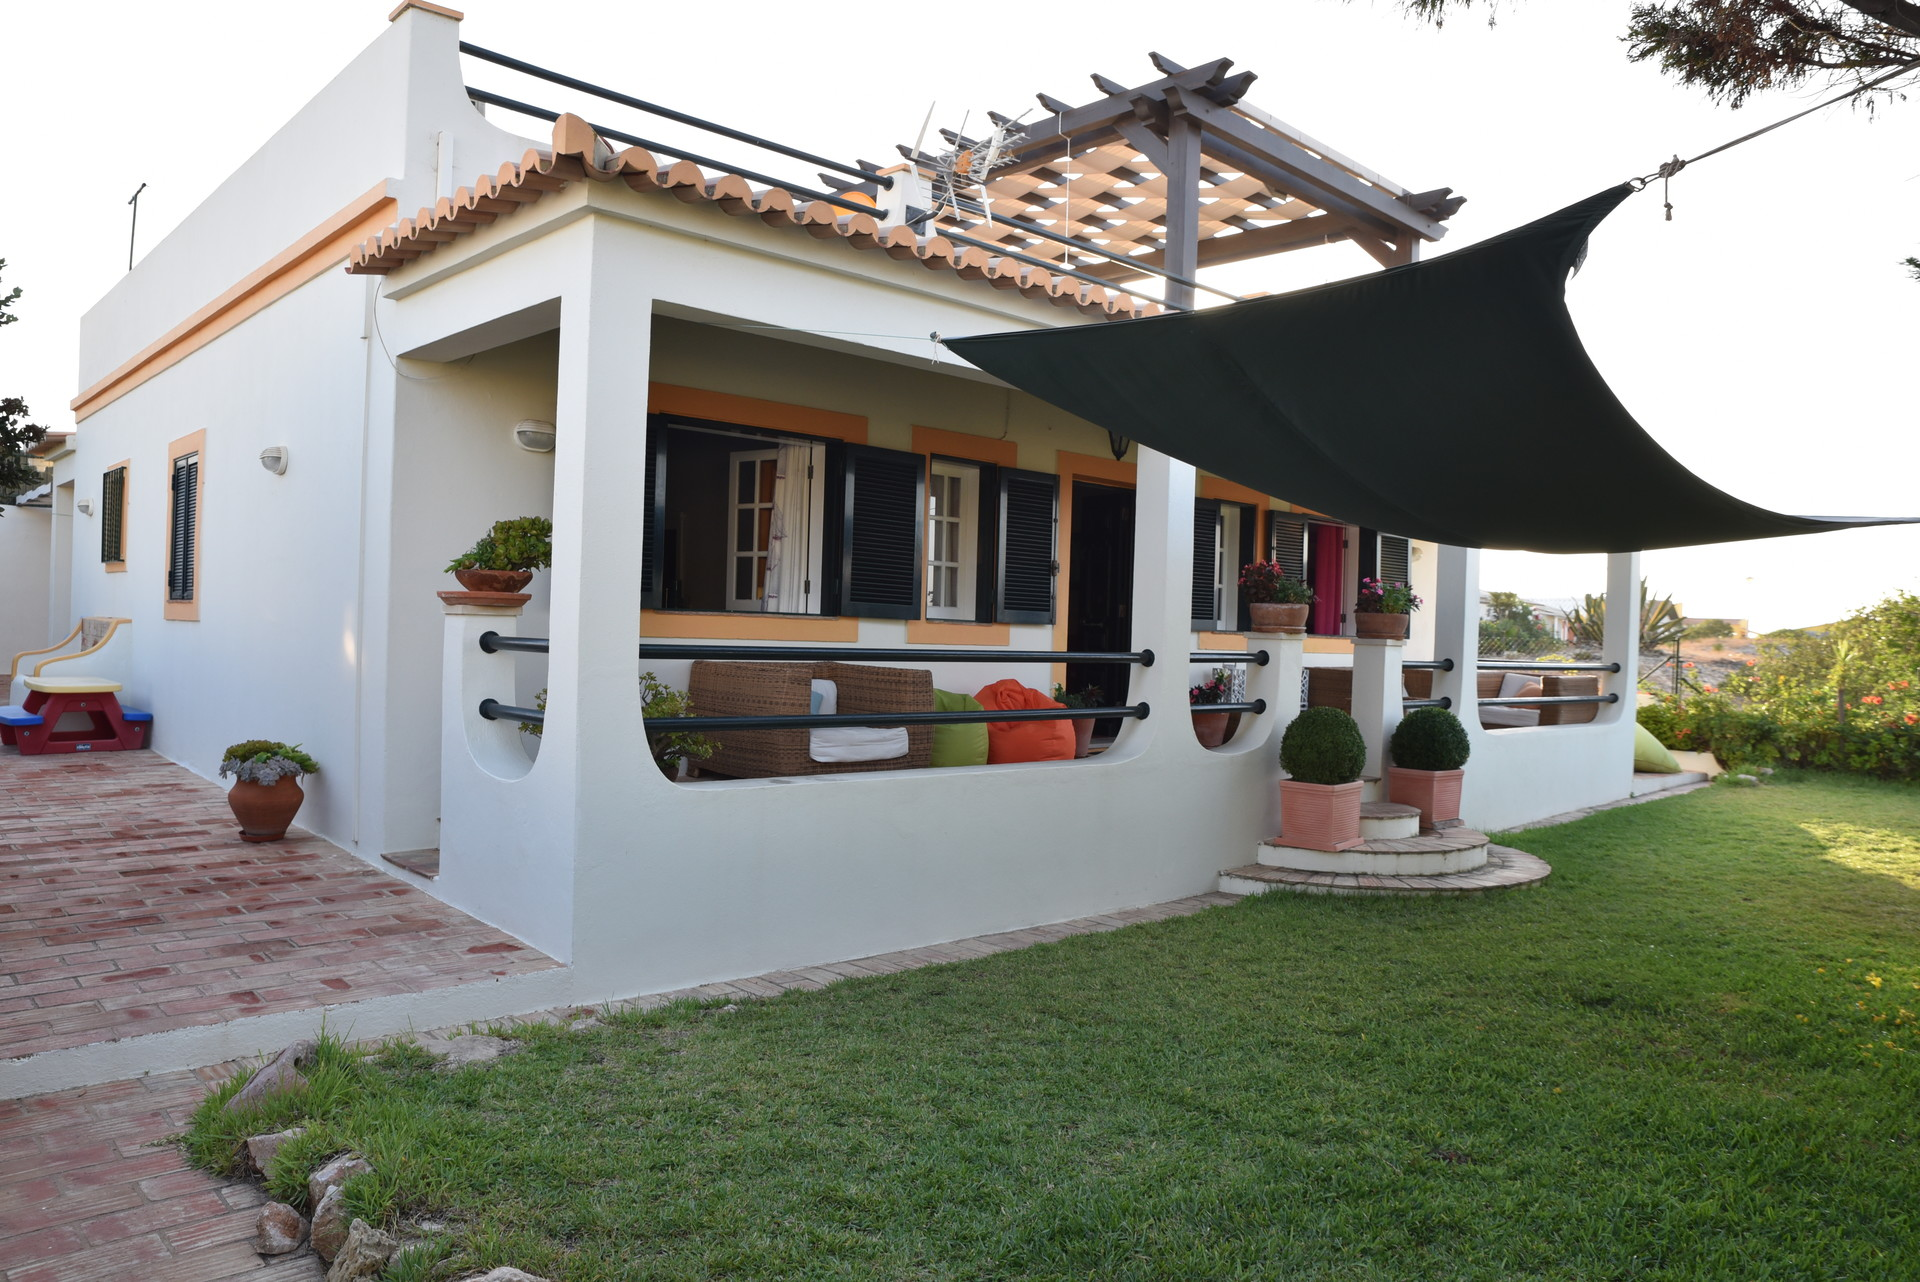 villa-algarve-at-beach-10-minutes-university-67e7078f0516915835b5a956618bb47e